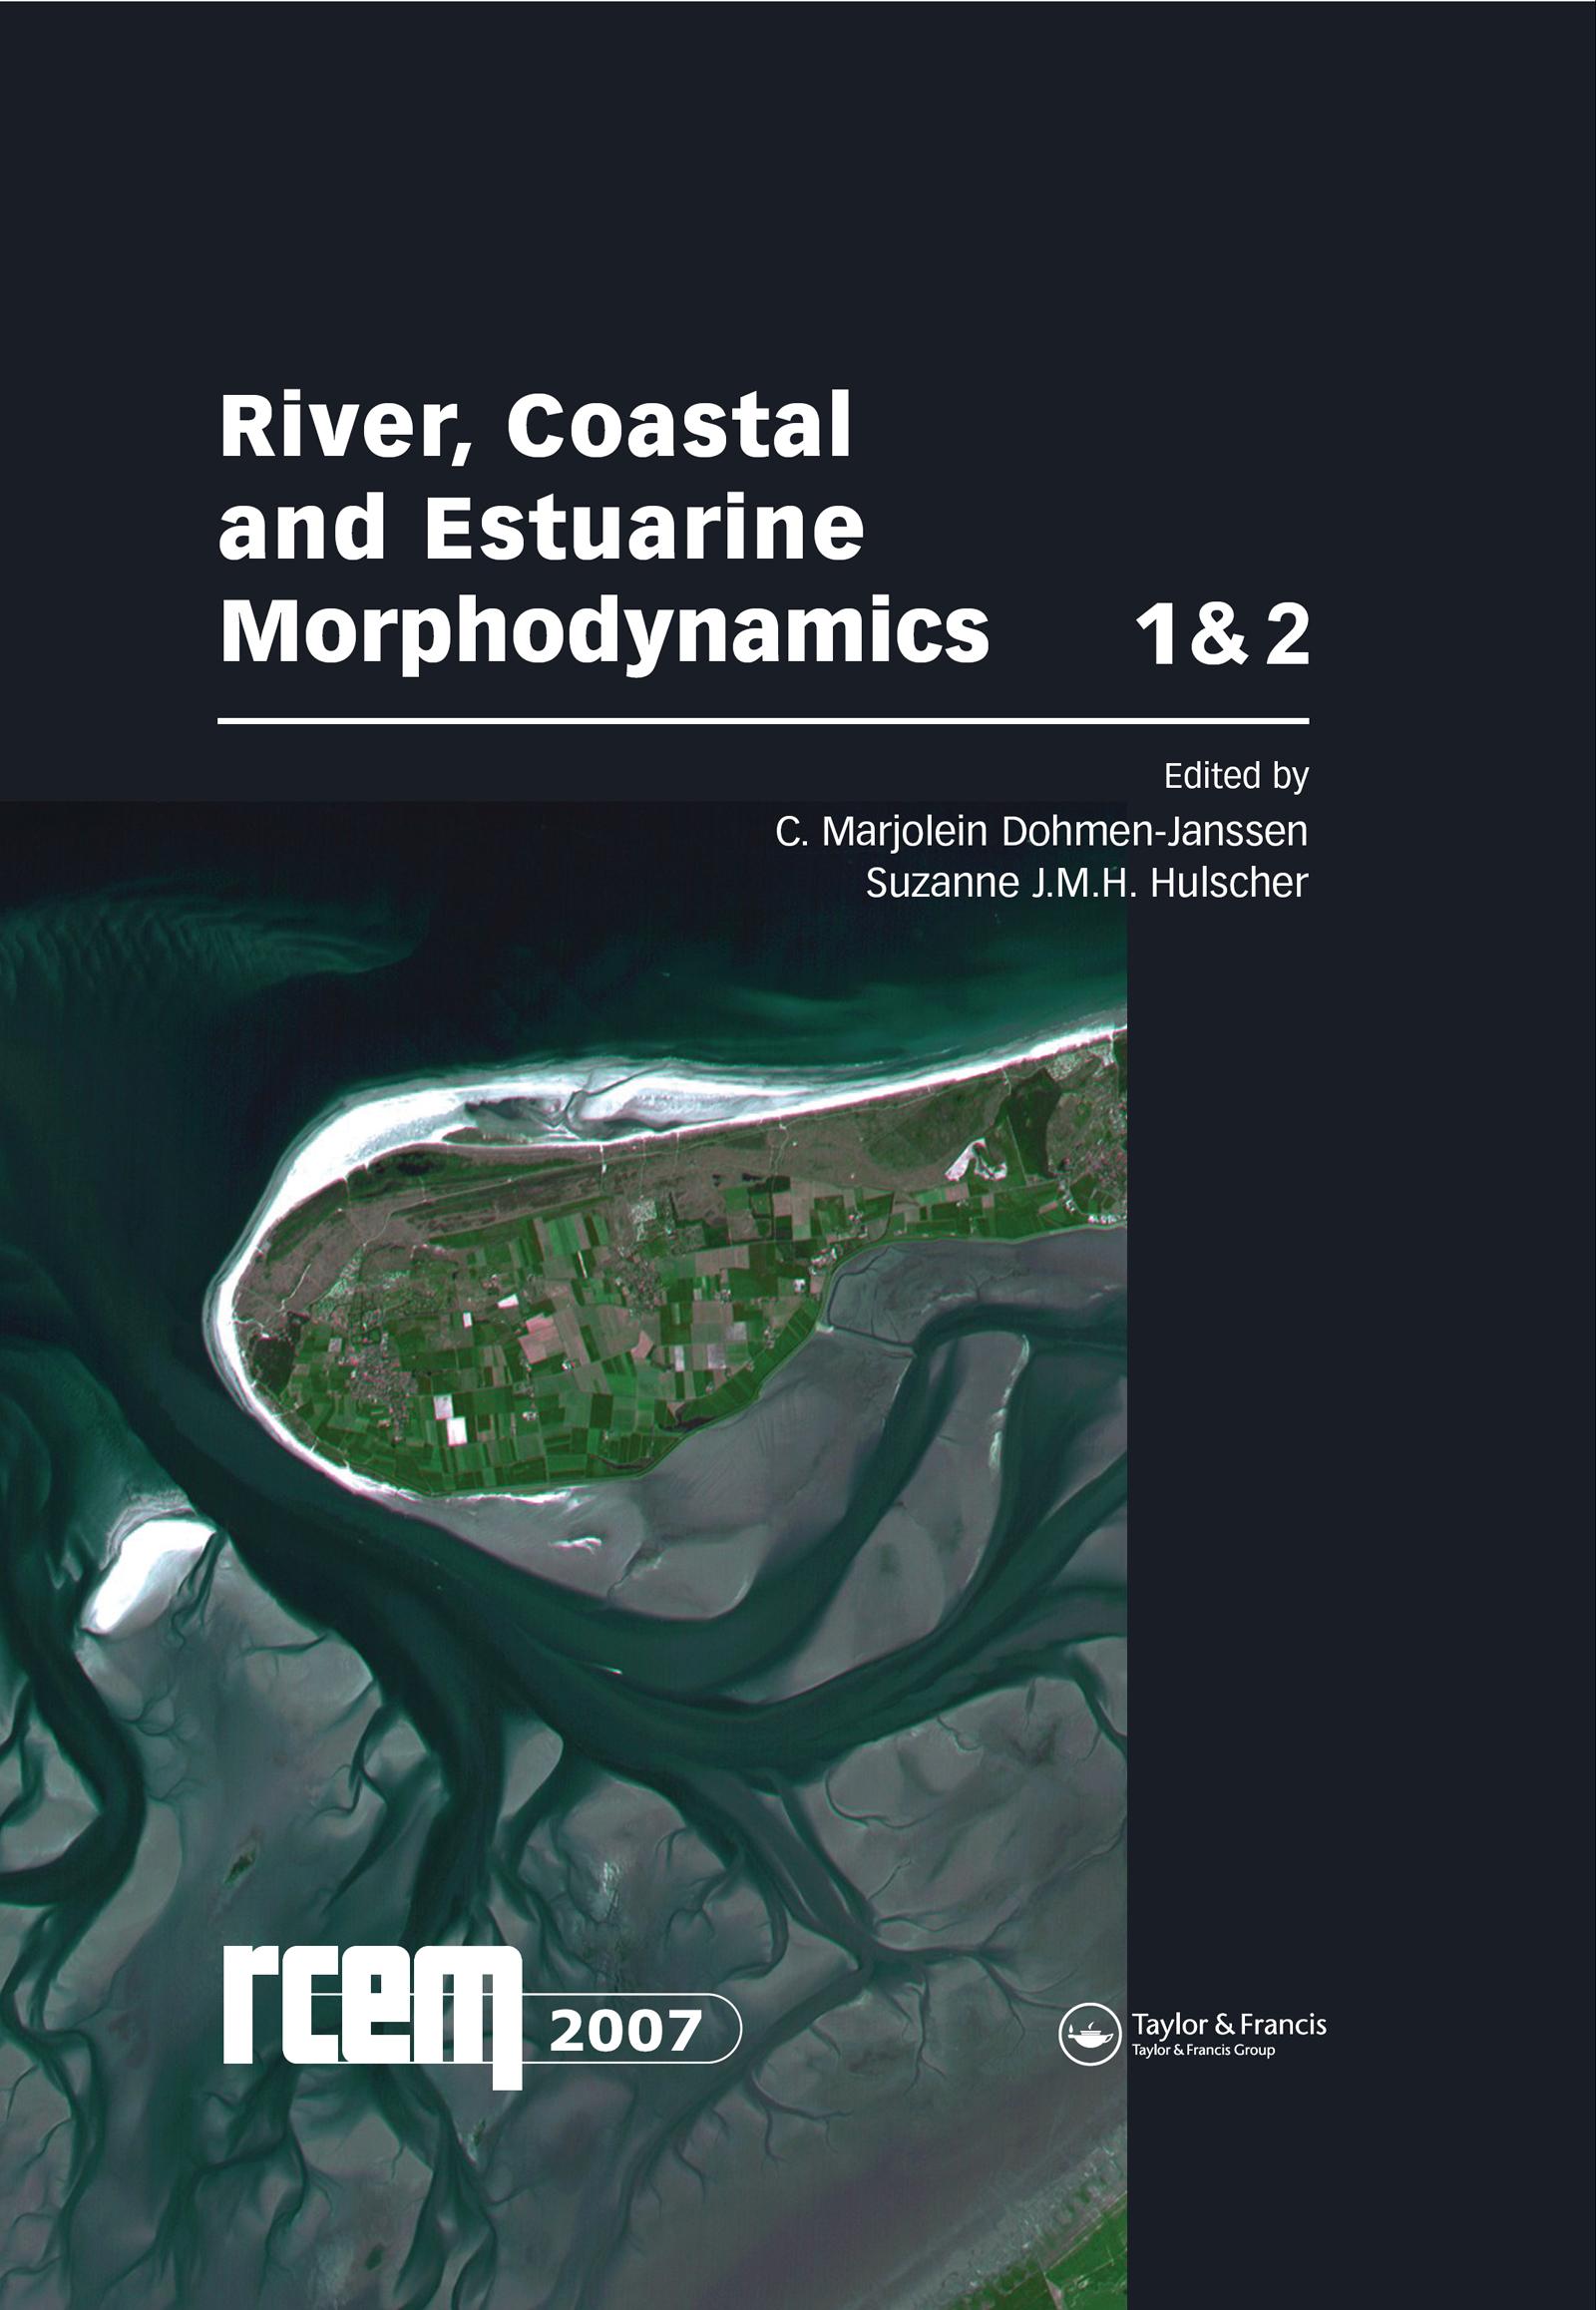 River, Coastal and Estuarine Morphodynamics: RCEM 2007, Two Volume Set